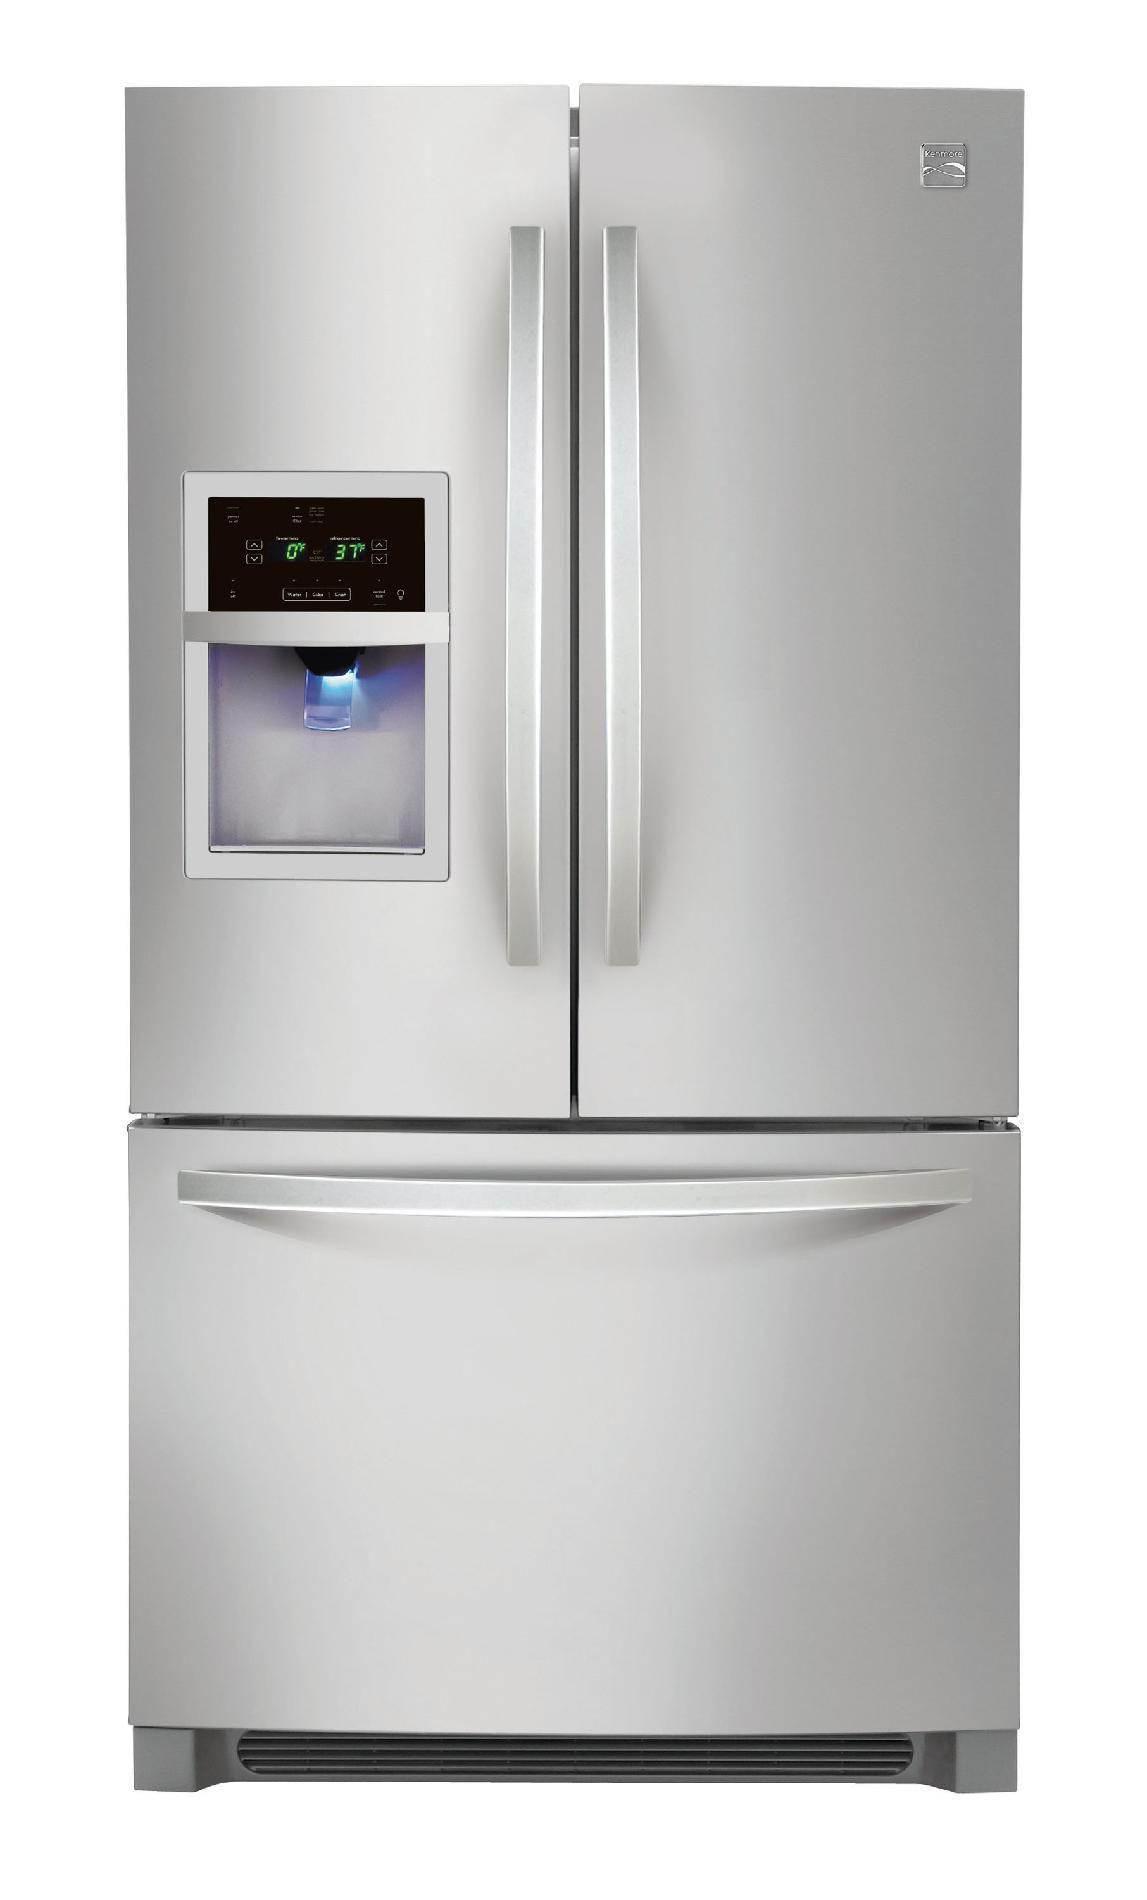 Kenmore French door refrigerator 26 7 cu ft Sears